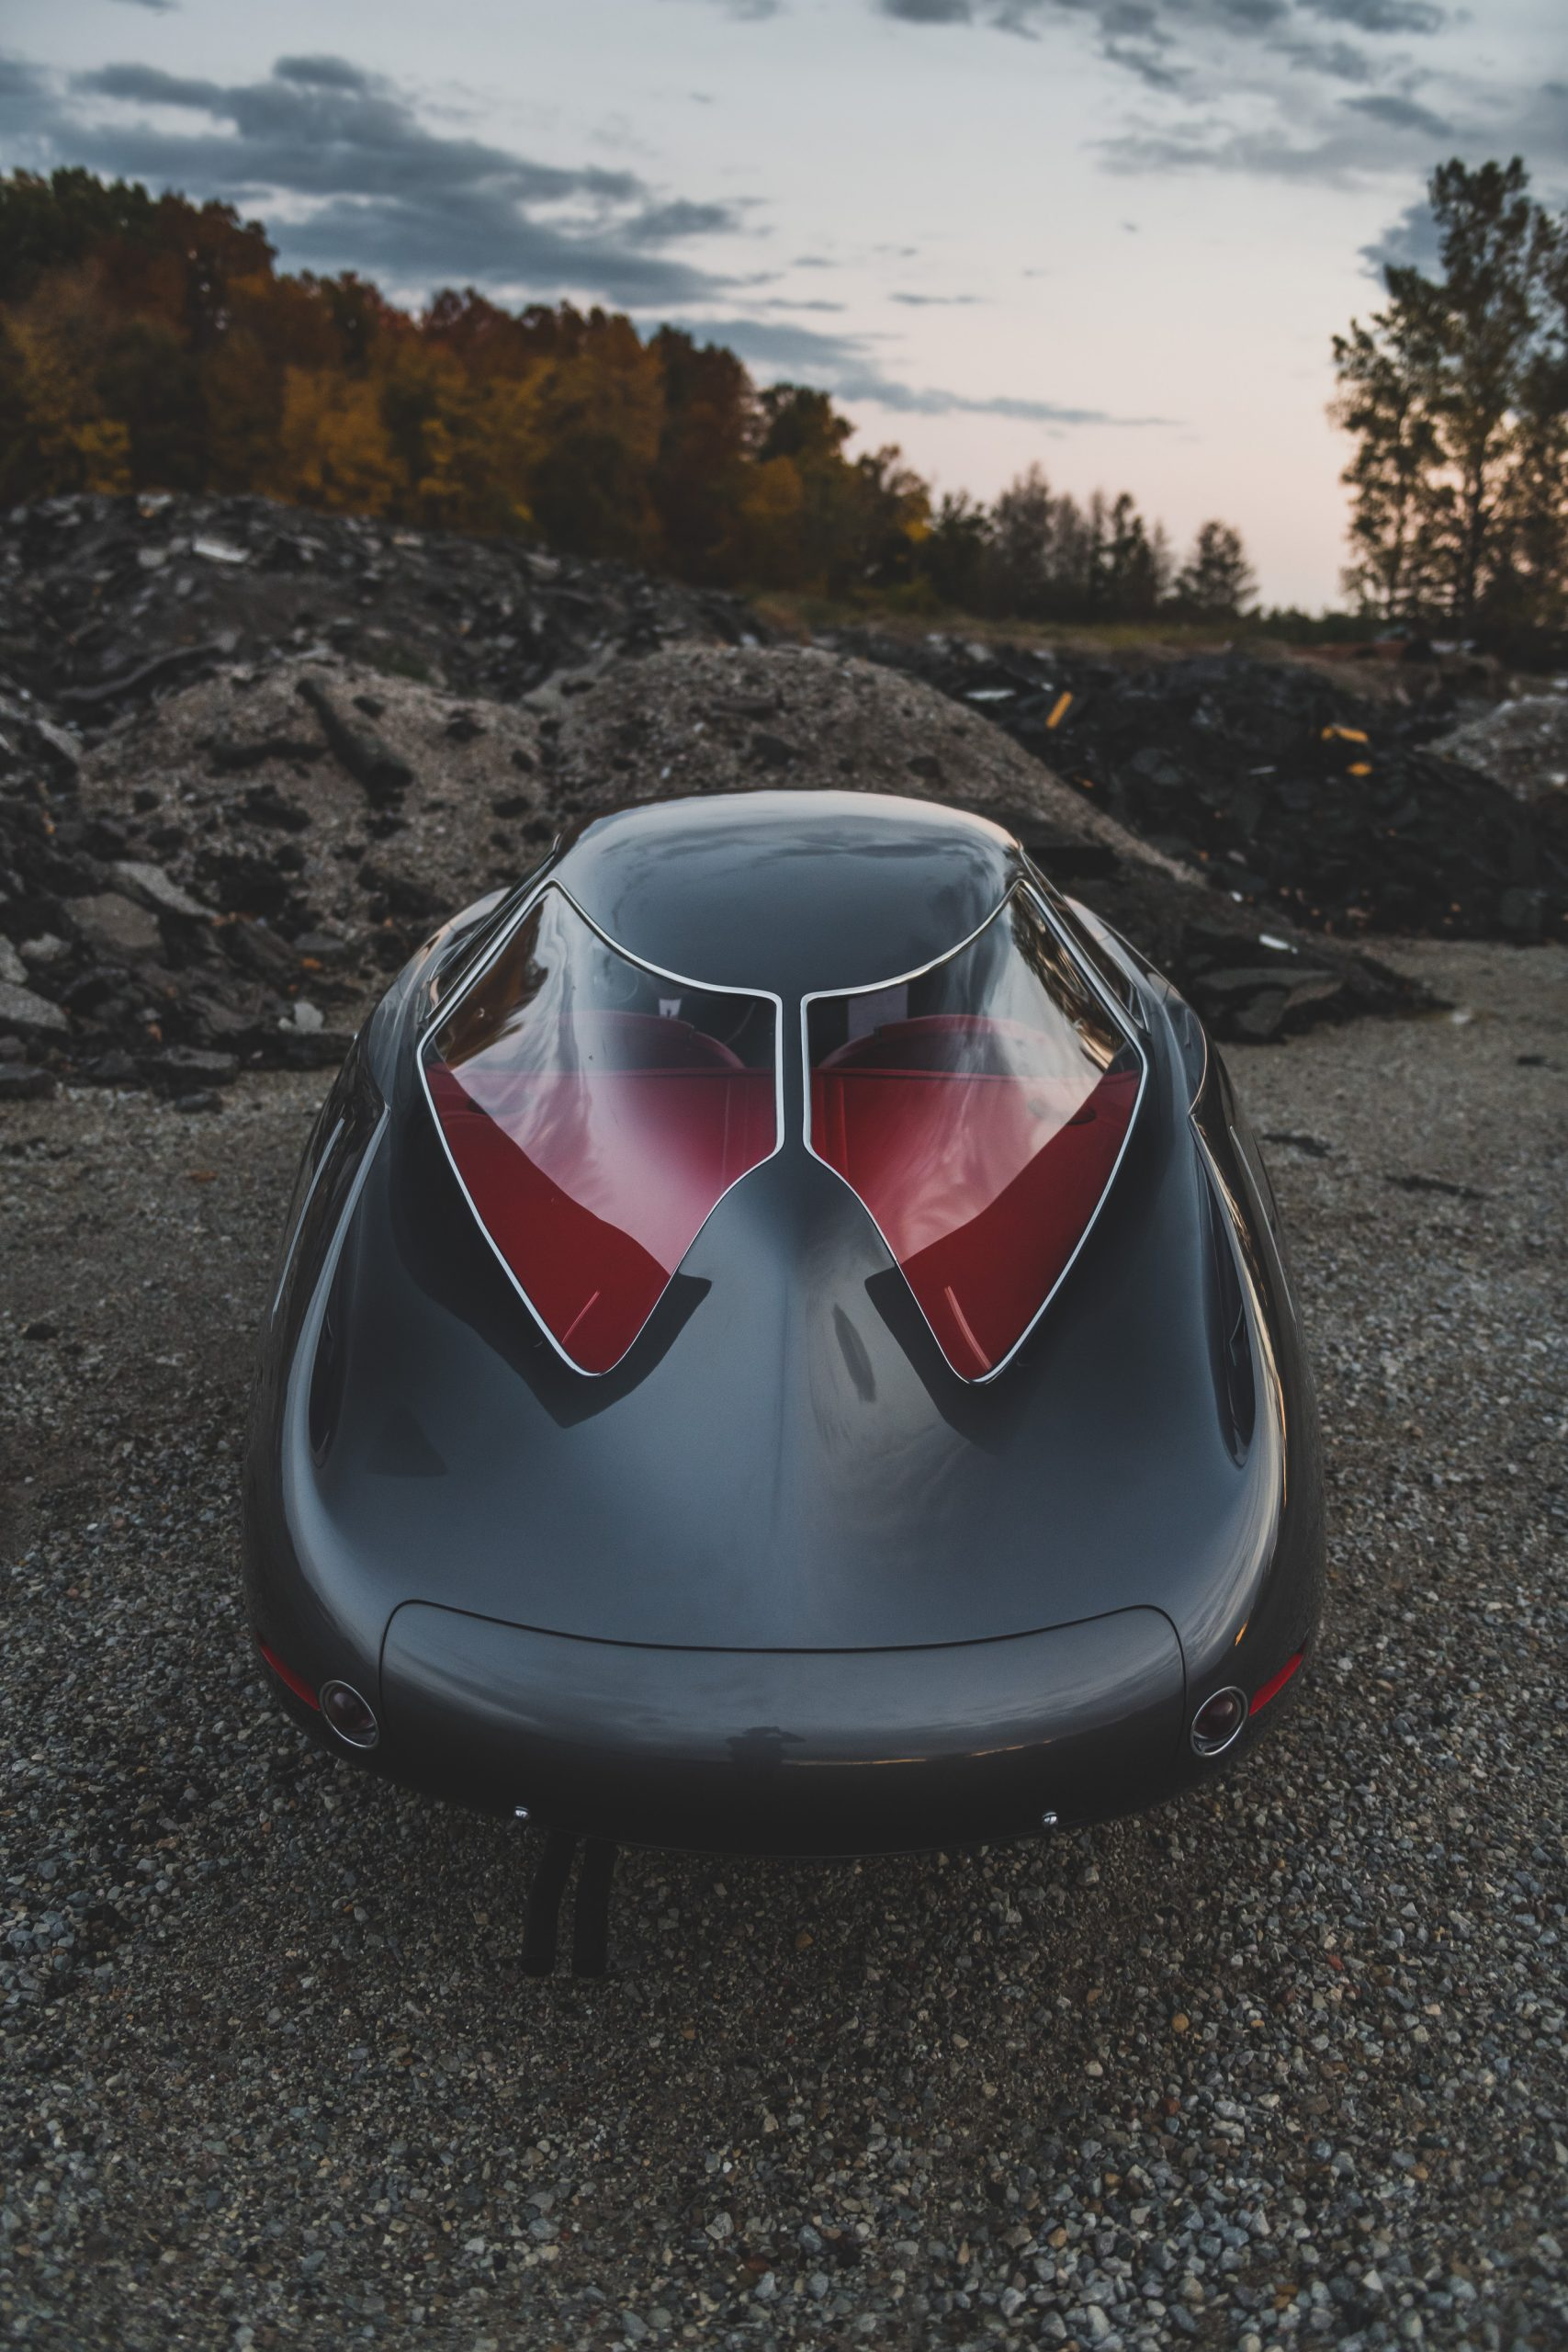 Alfa Romeo Berlina Aerodinamica Tecnica rear